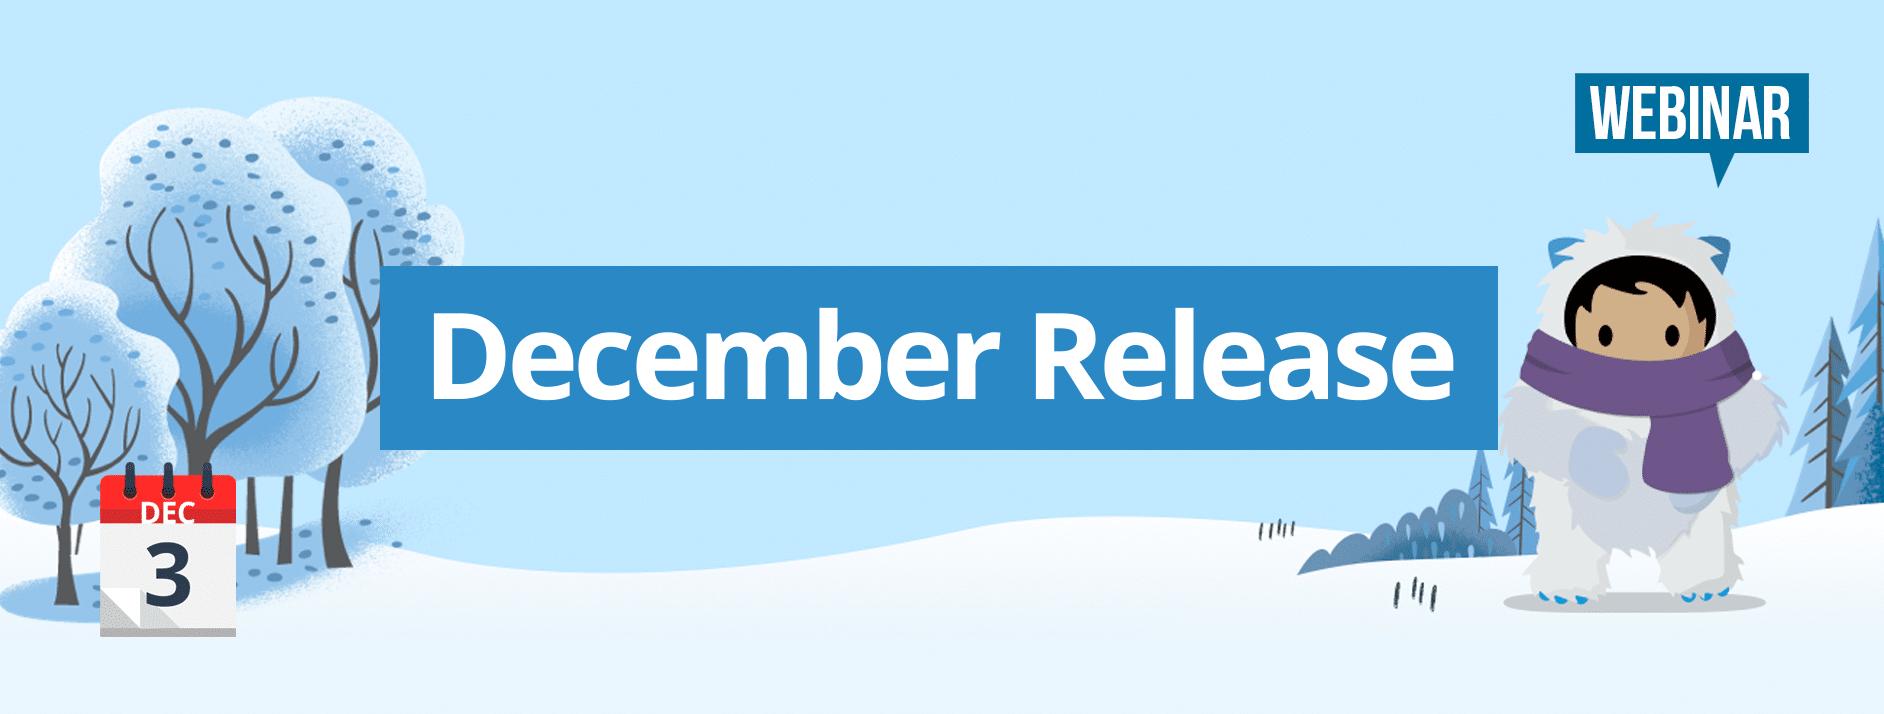 Webinar december release Netive VMS